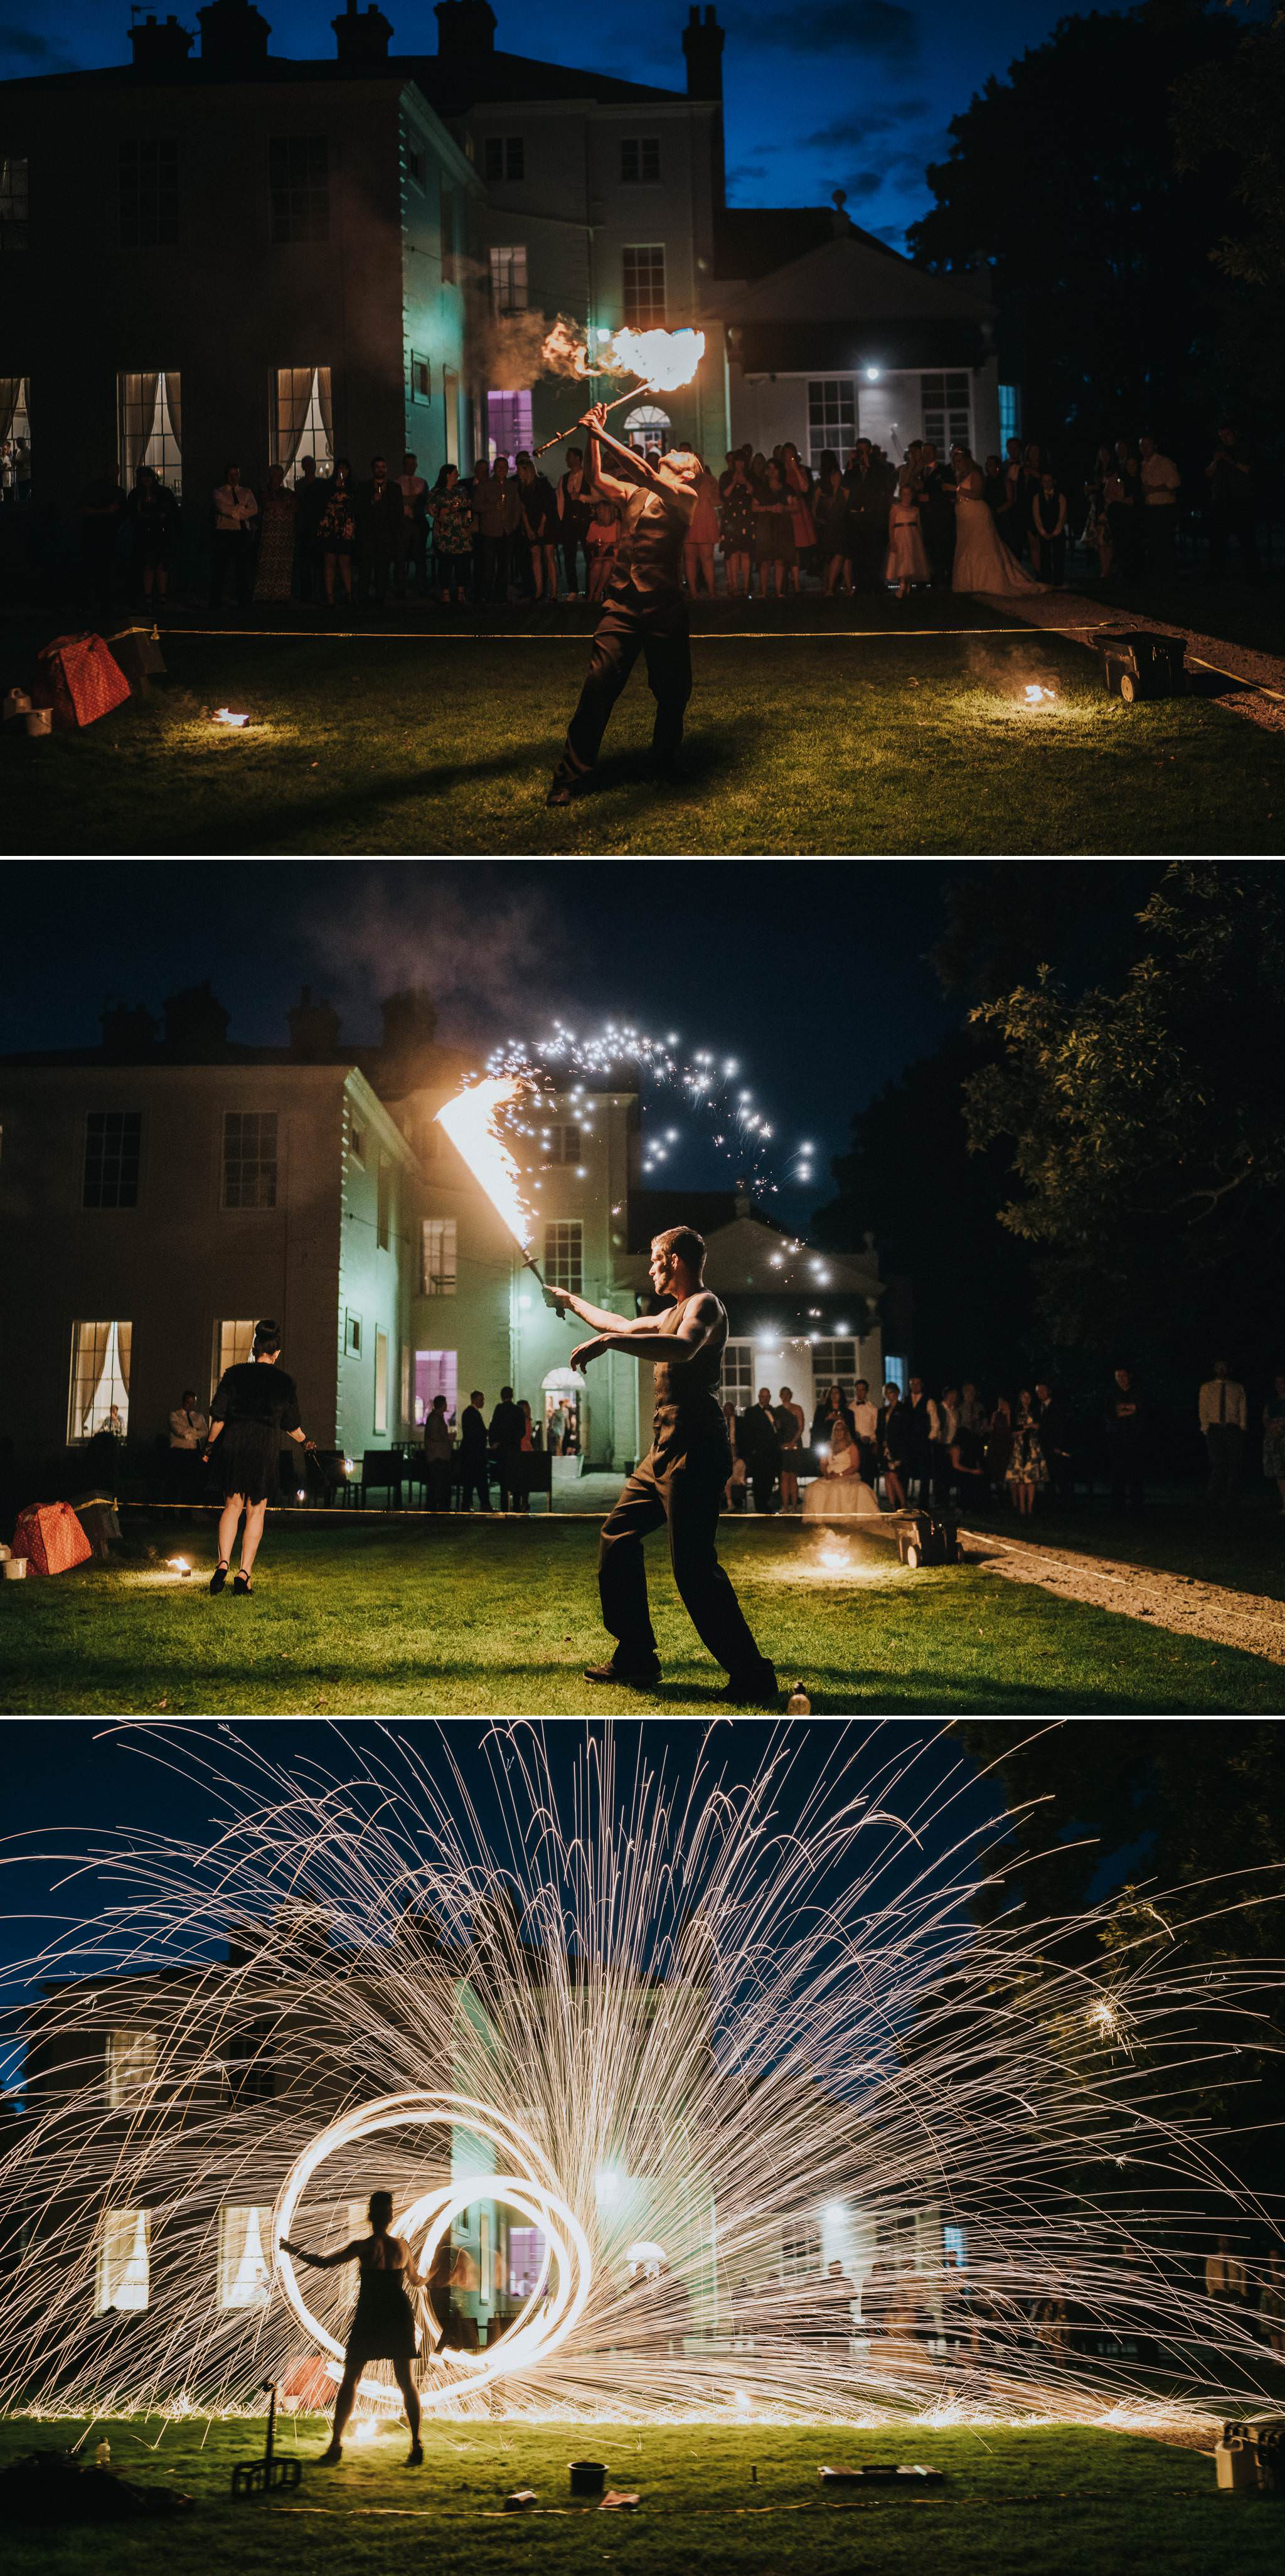 somerford-hall-wedding-photography 24.jpg